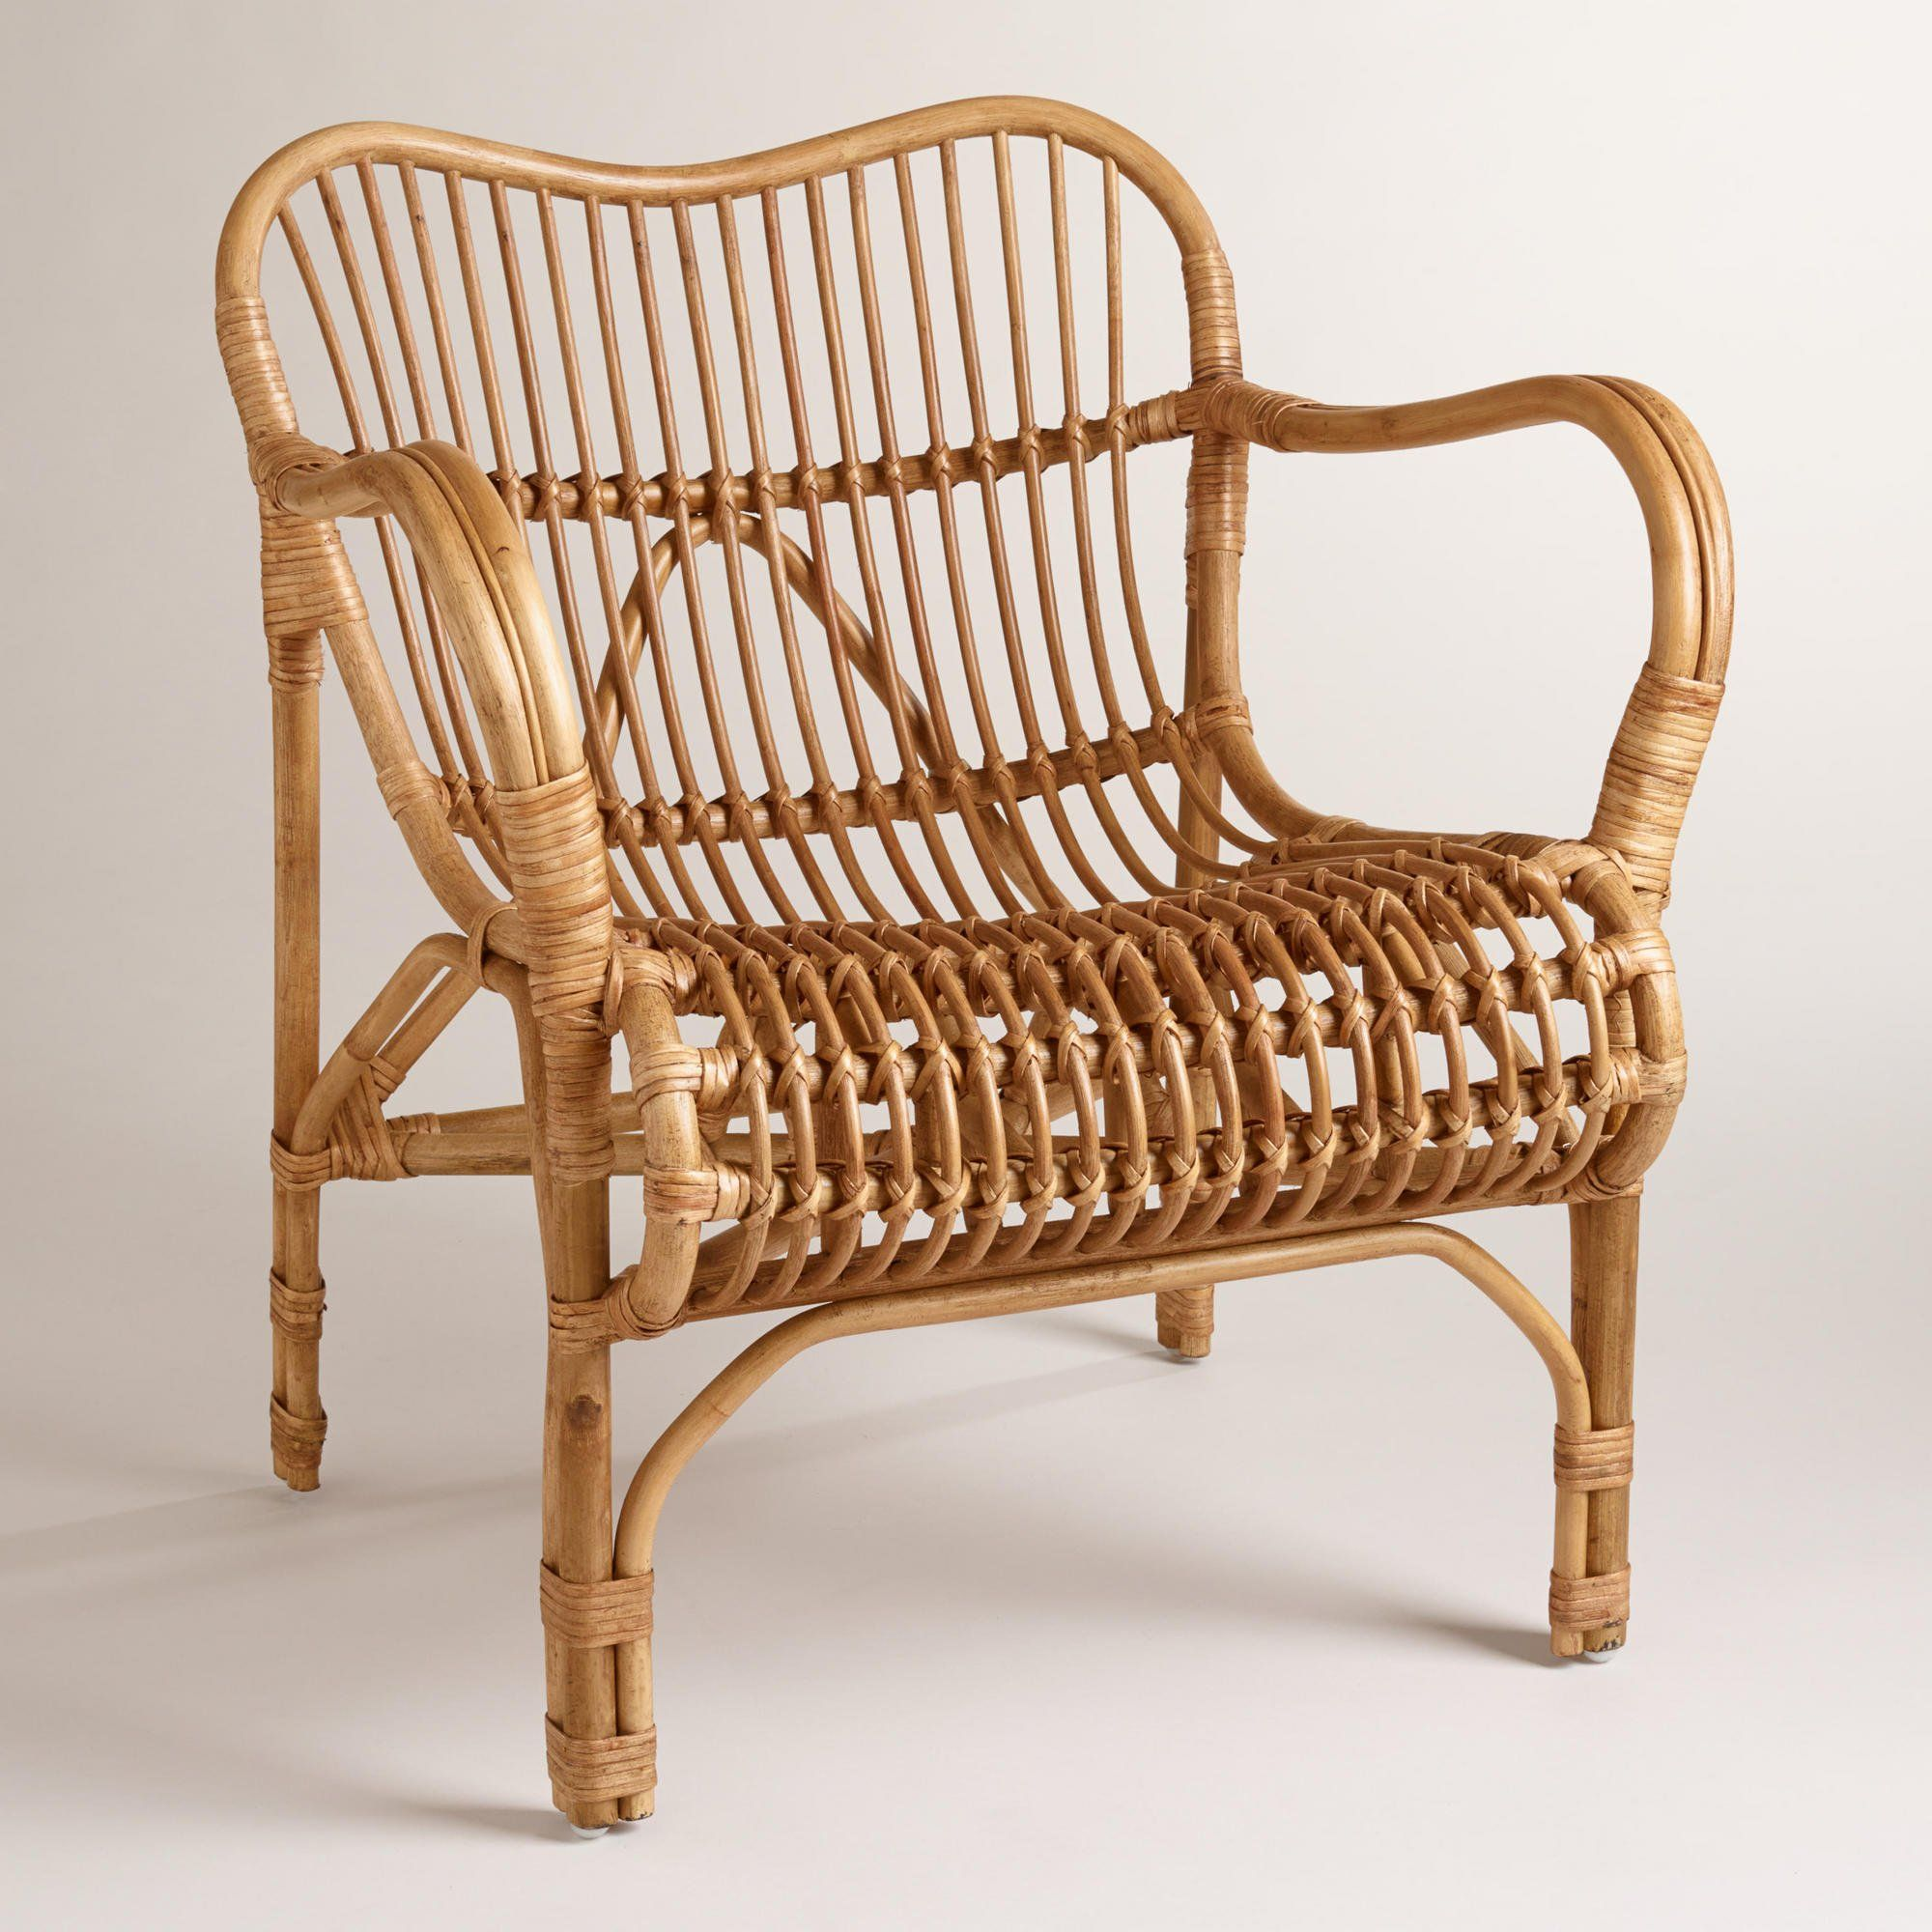 Rattan Chairs Ikea Rattan Cole Chair Rattan Chair Indoor Wicker